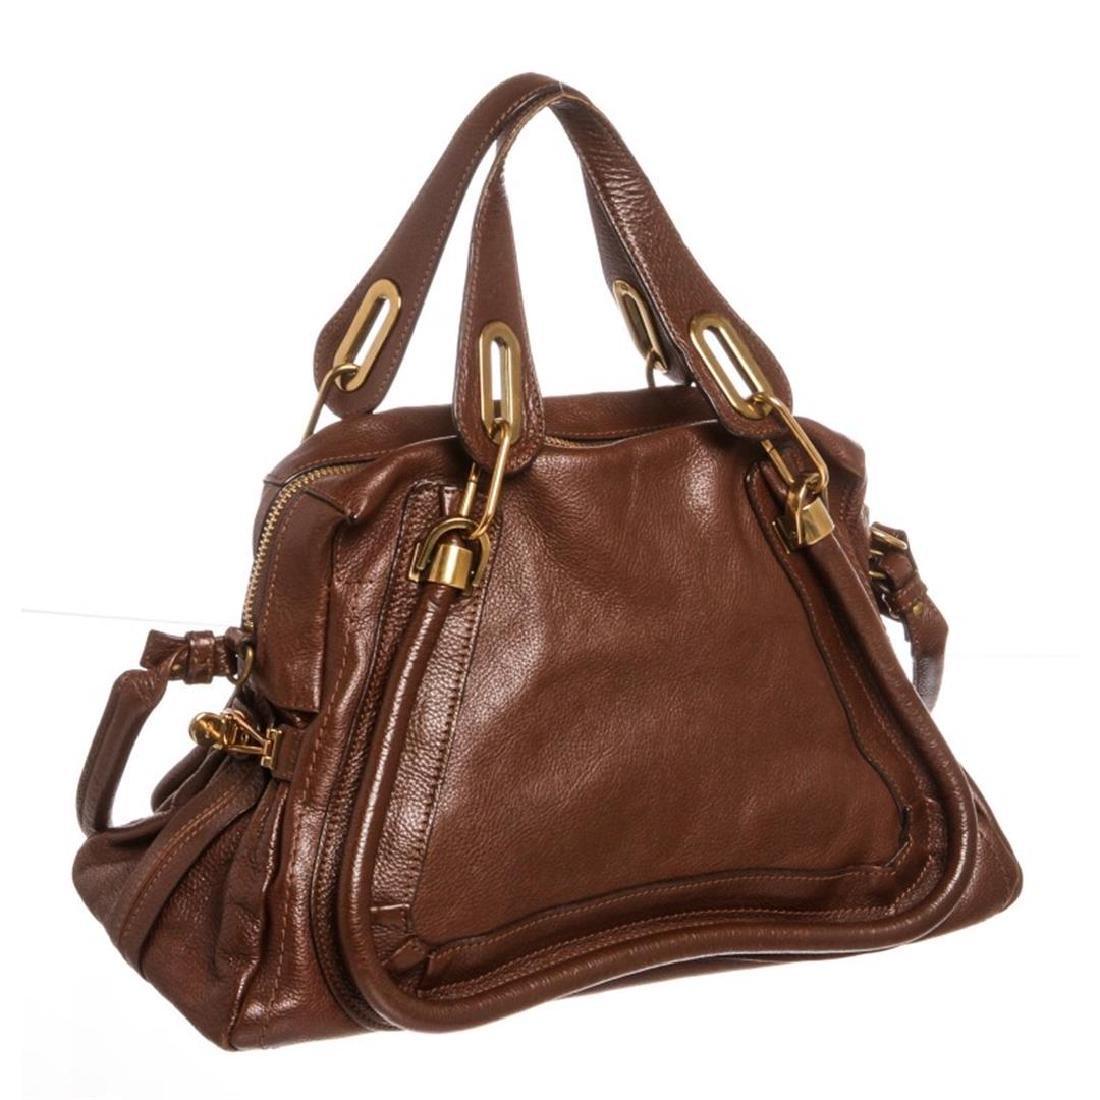 Chloe Brown Leather Paraty Medium Satchel Handbag - 3